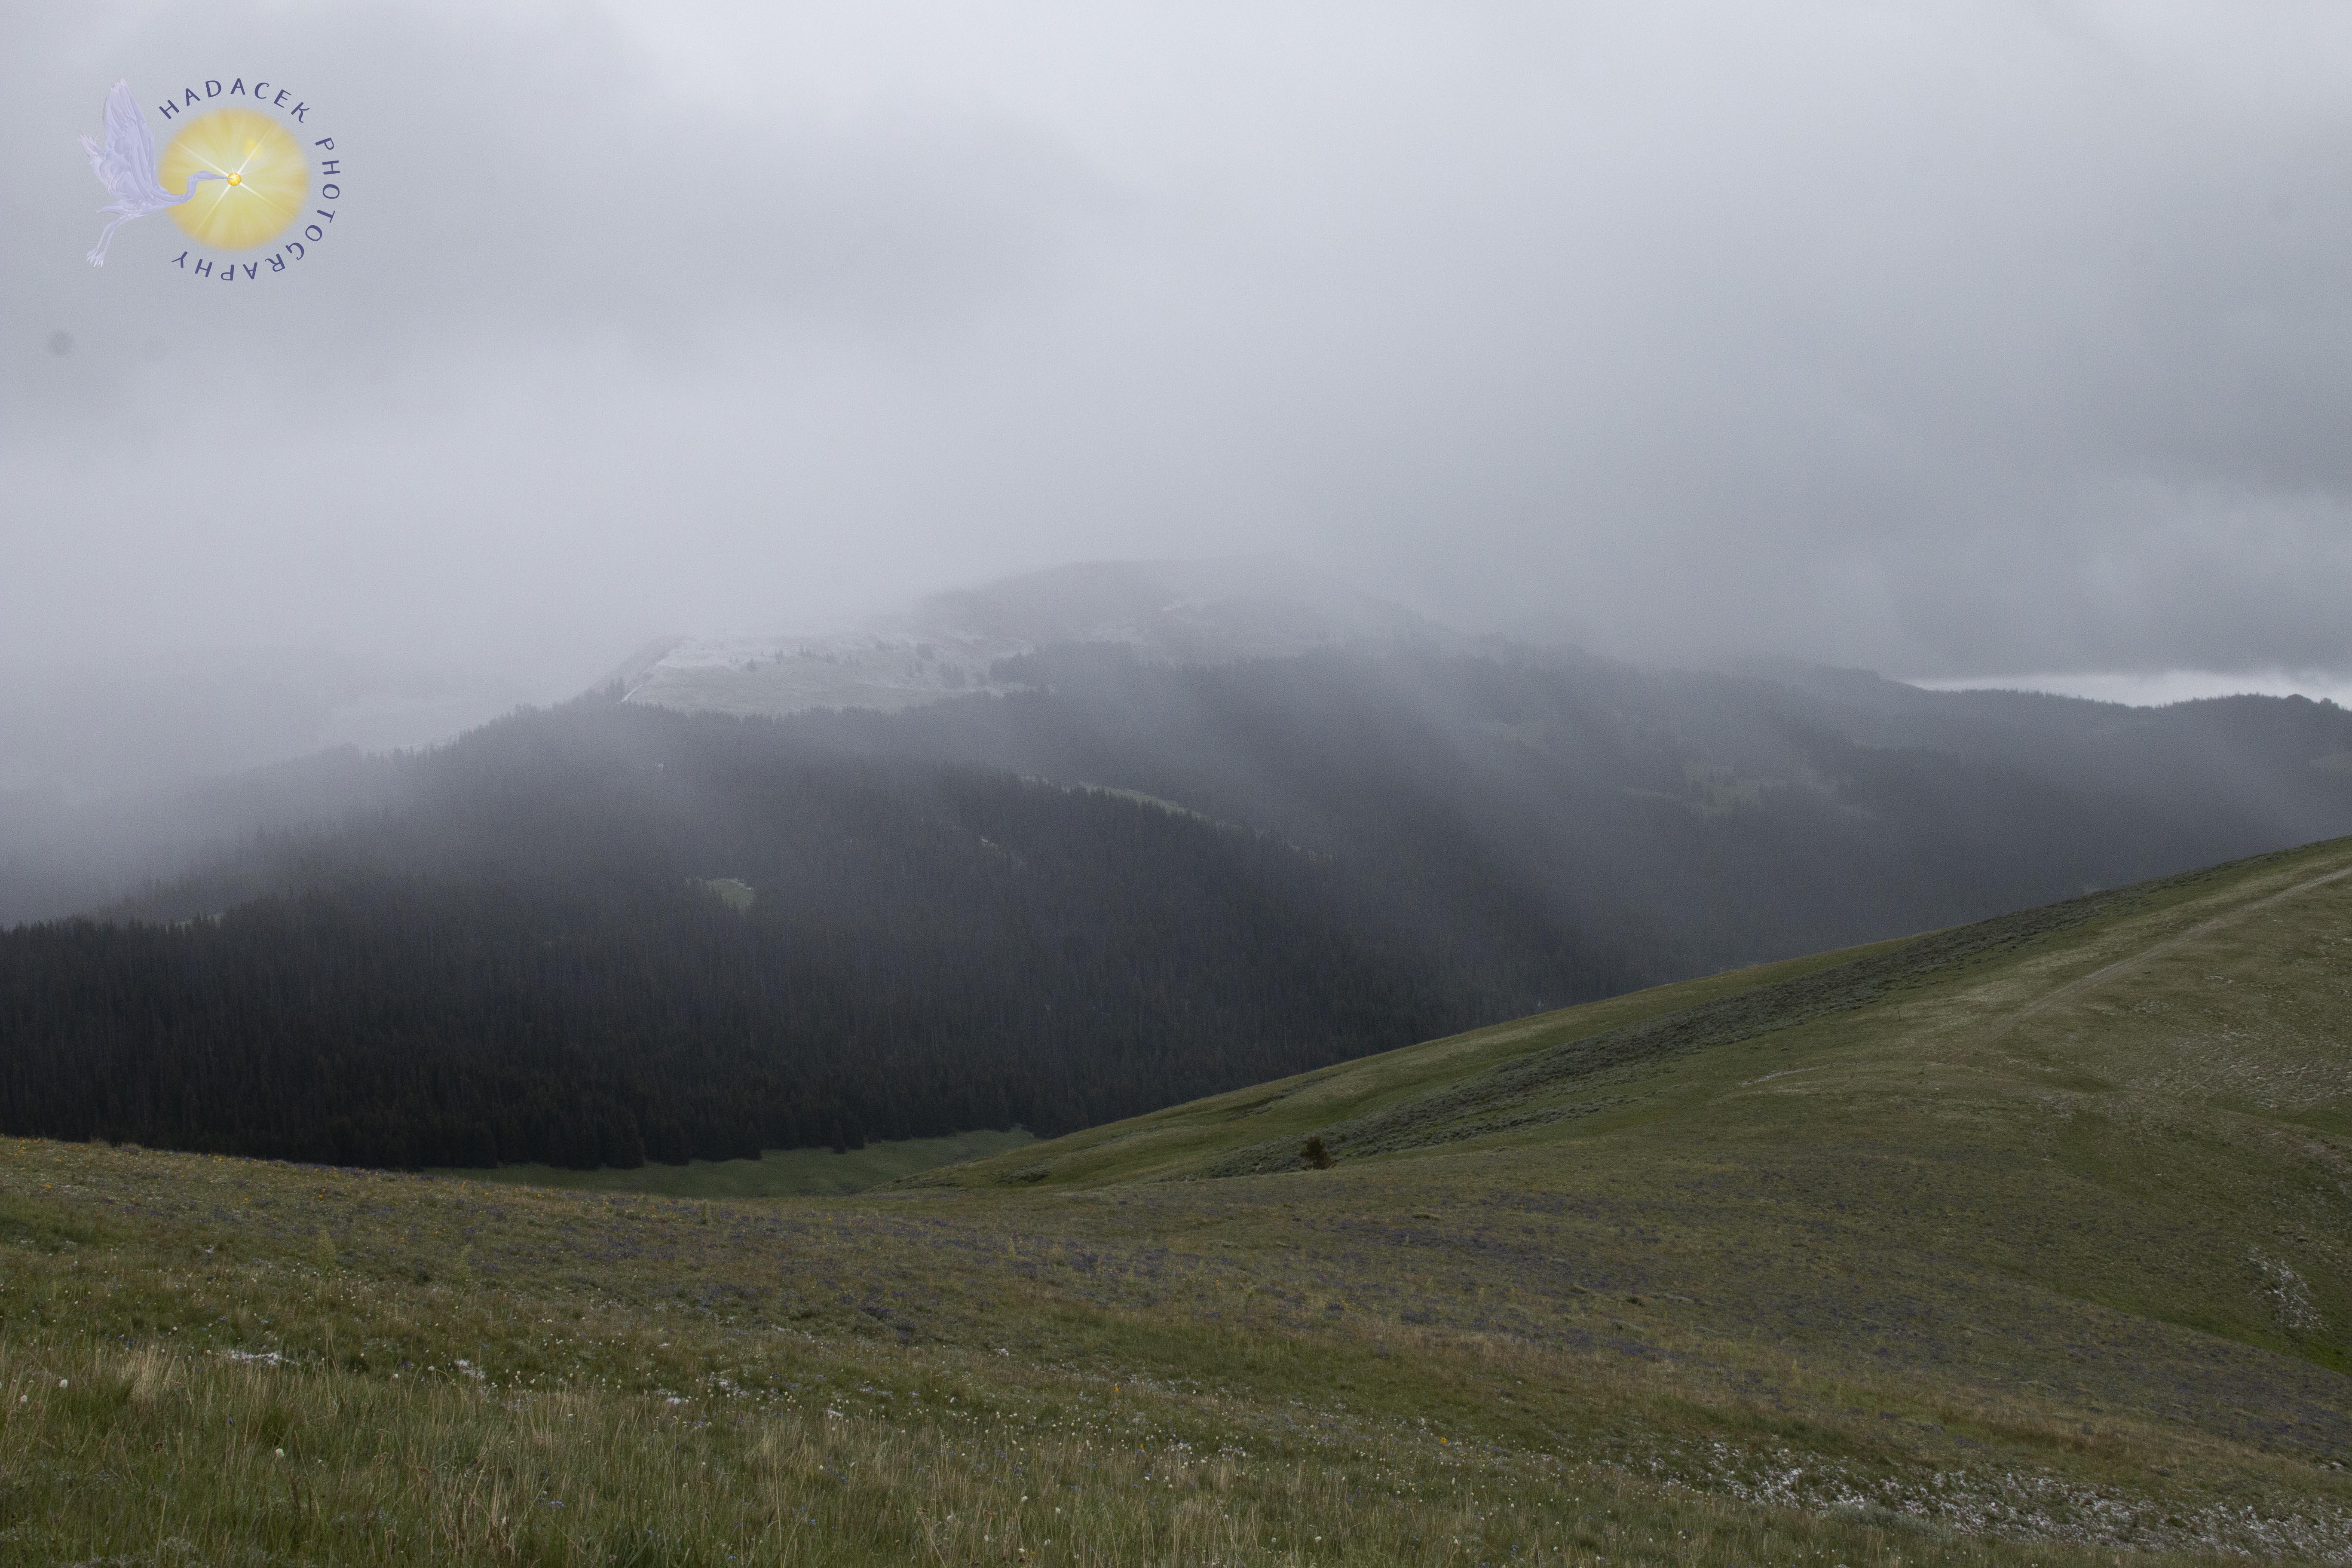 rolling hills in mist